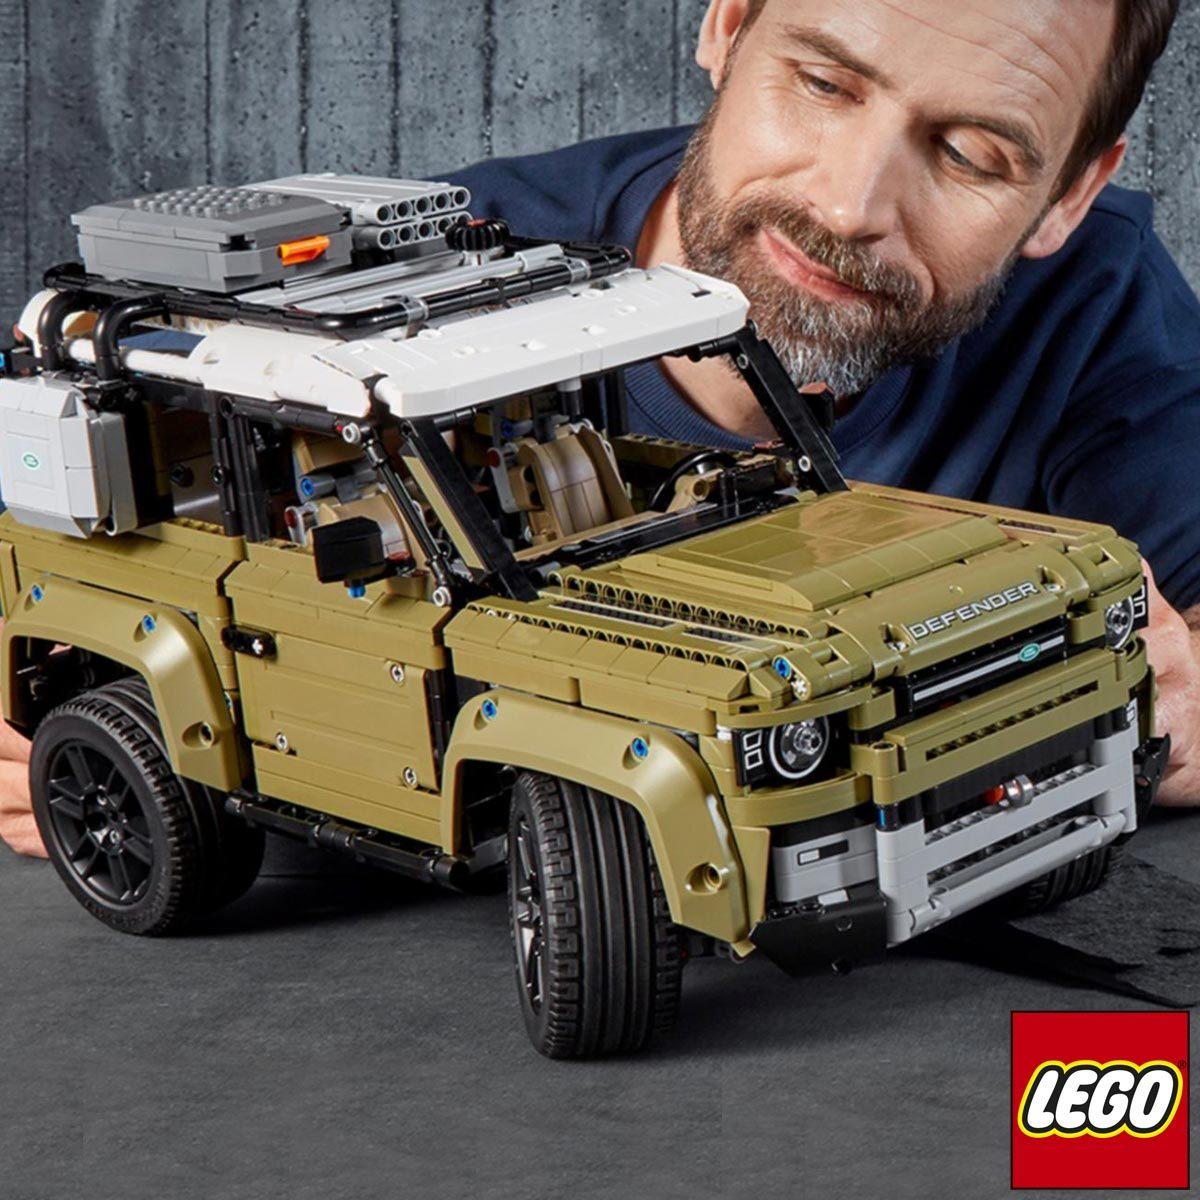 LEGO Technic Land Rover Defender - Model 42110 (11+ Years) £129.99 @ Costco